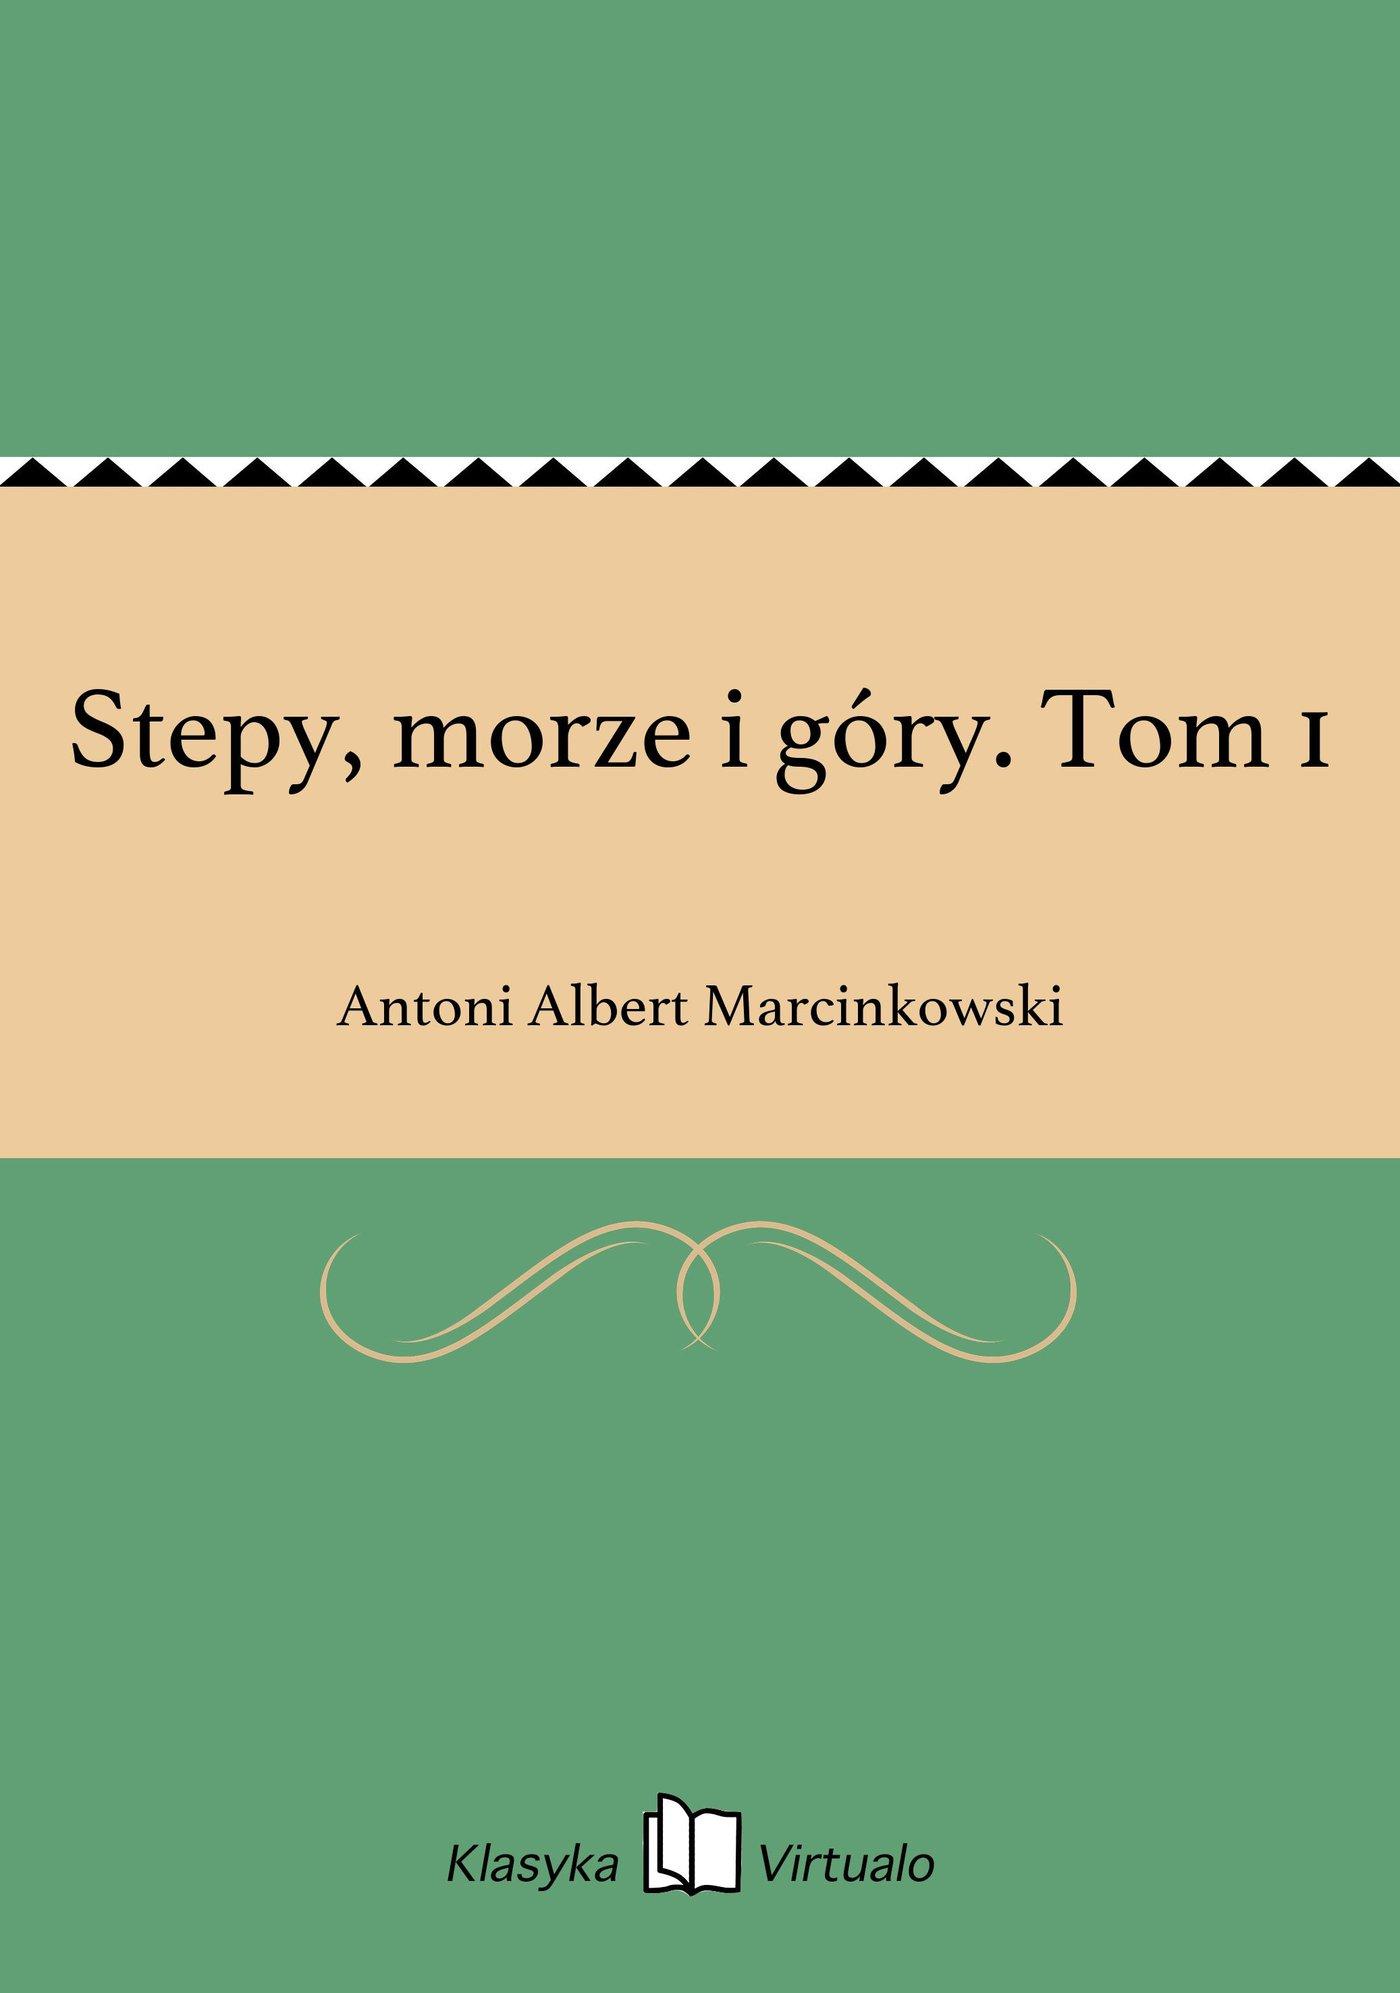 Stepy, morze i góry. Tom 1 - Ebook (Książka na Kindle) do pobrania w formacie MOBI